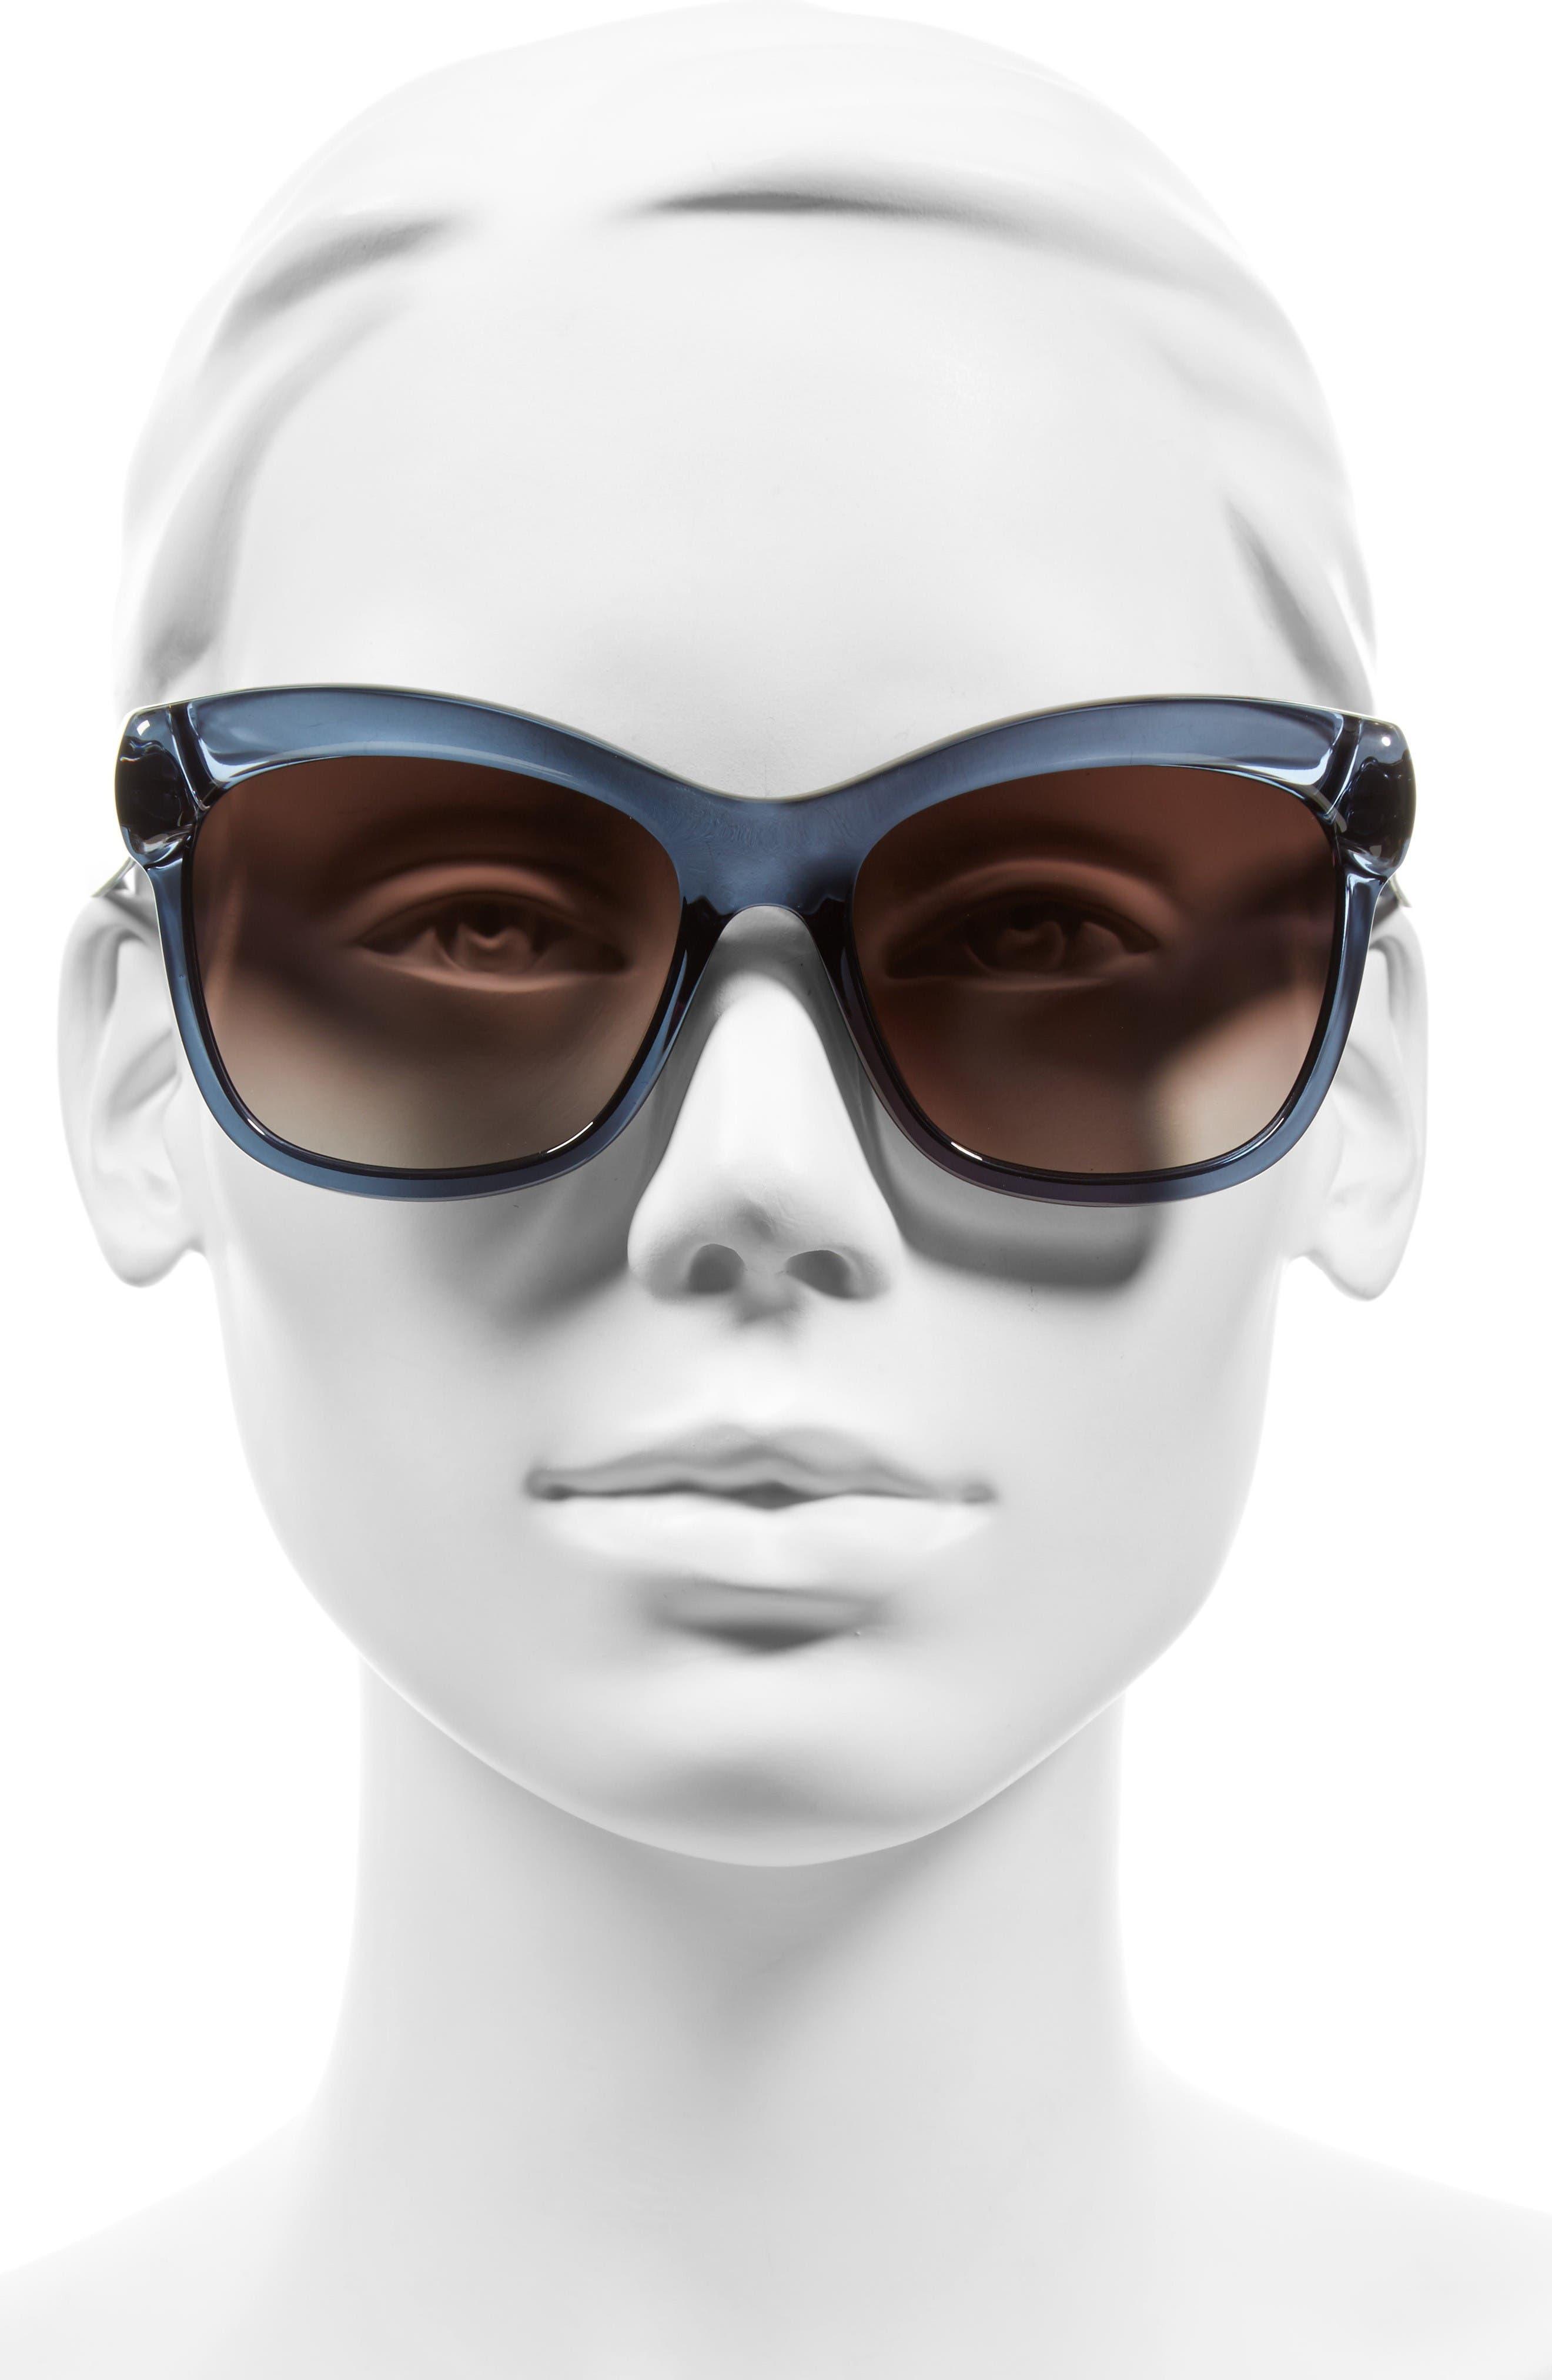 55mm Retro Sunglasses,                             Alternate thumbnail 2, color,                             Blue